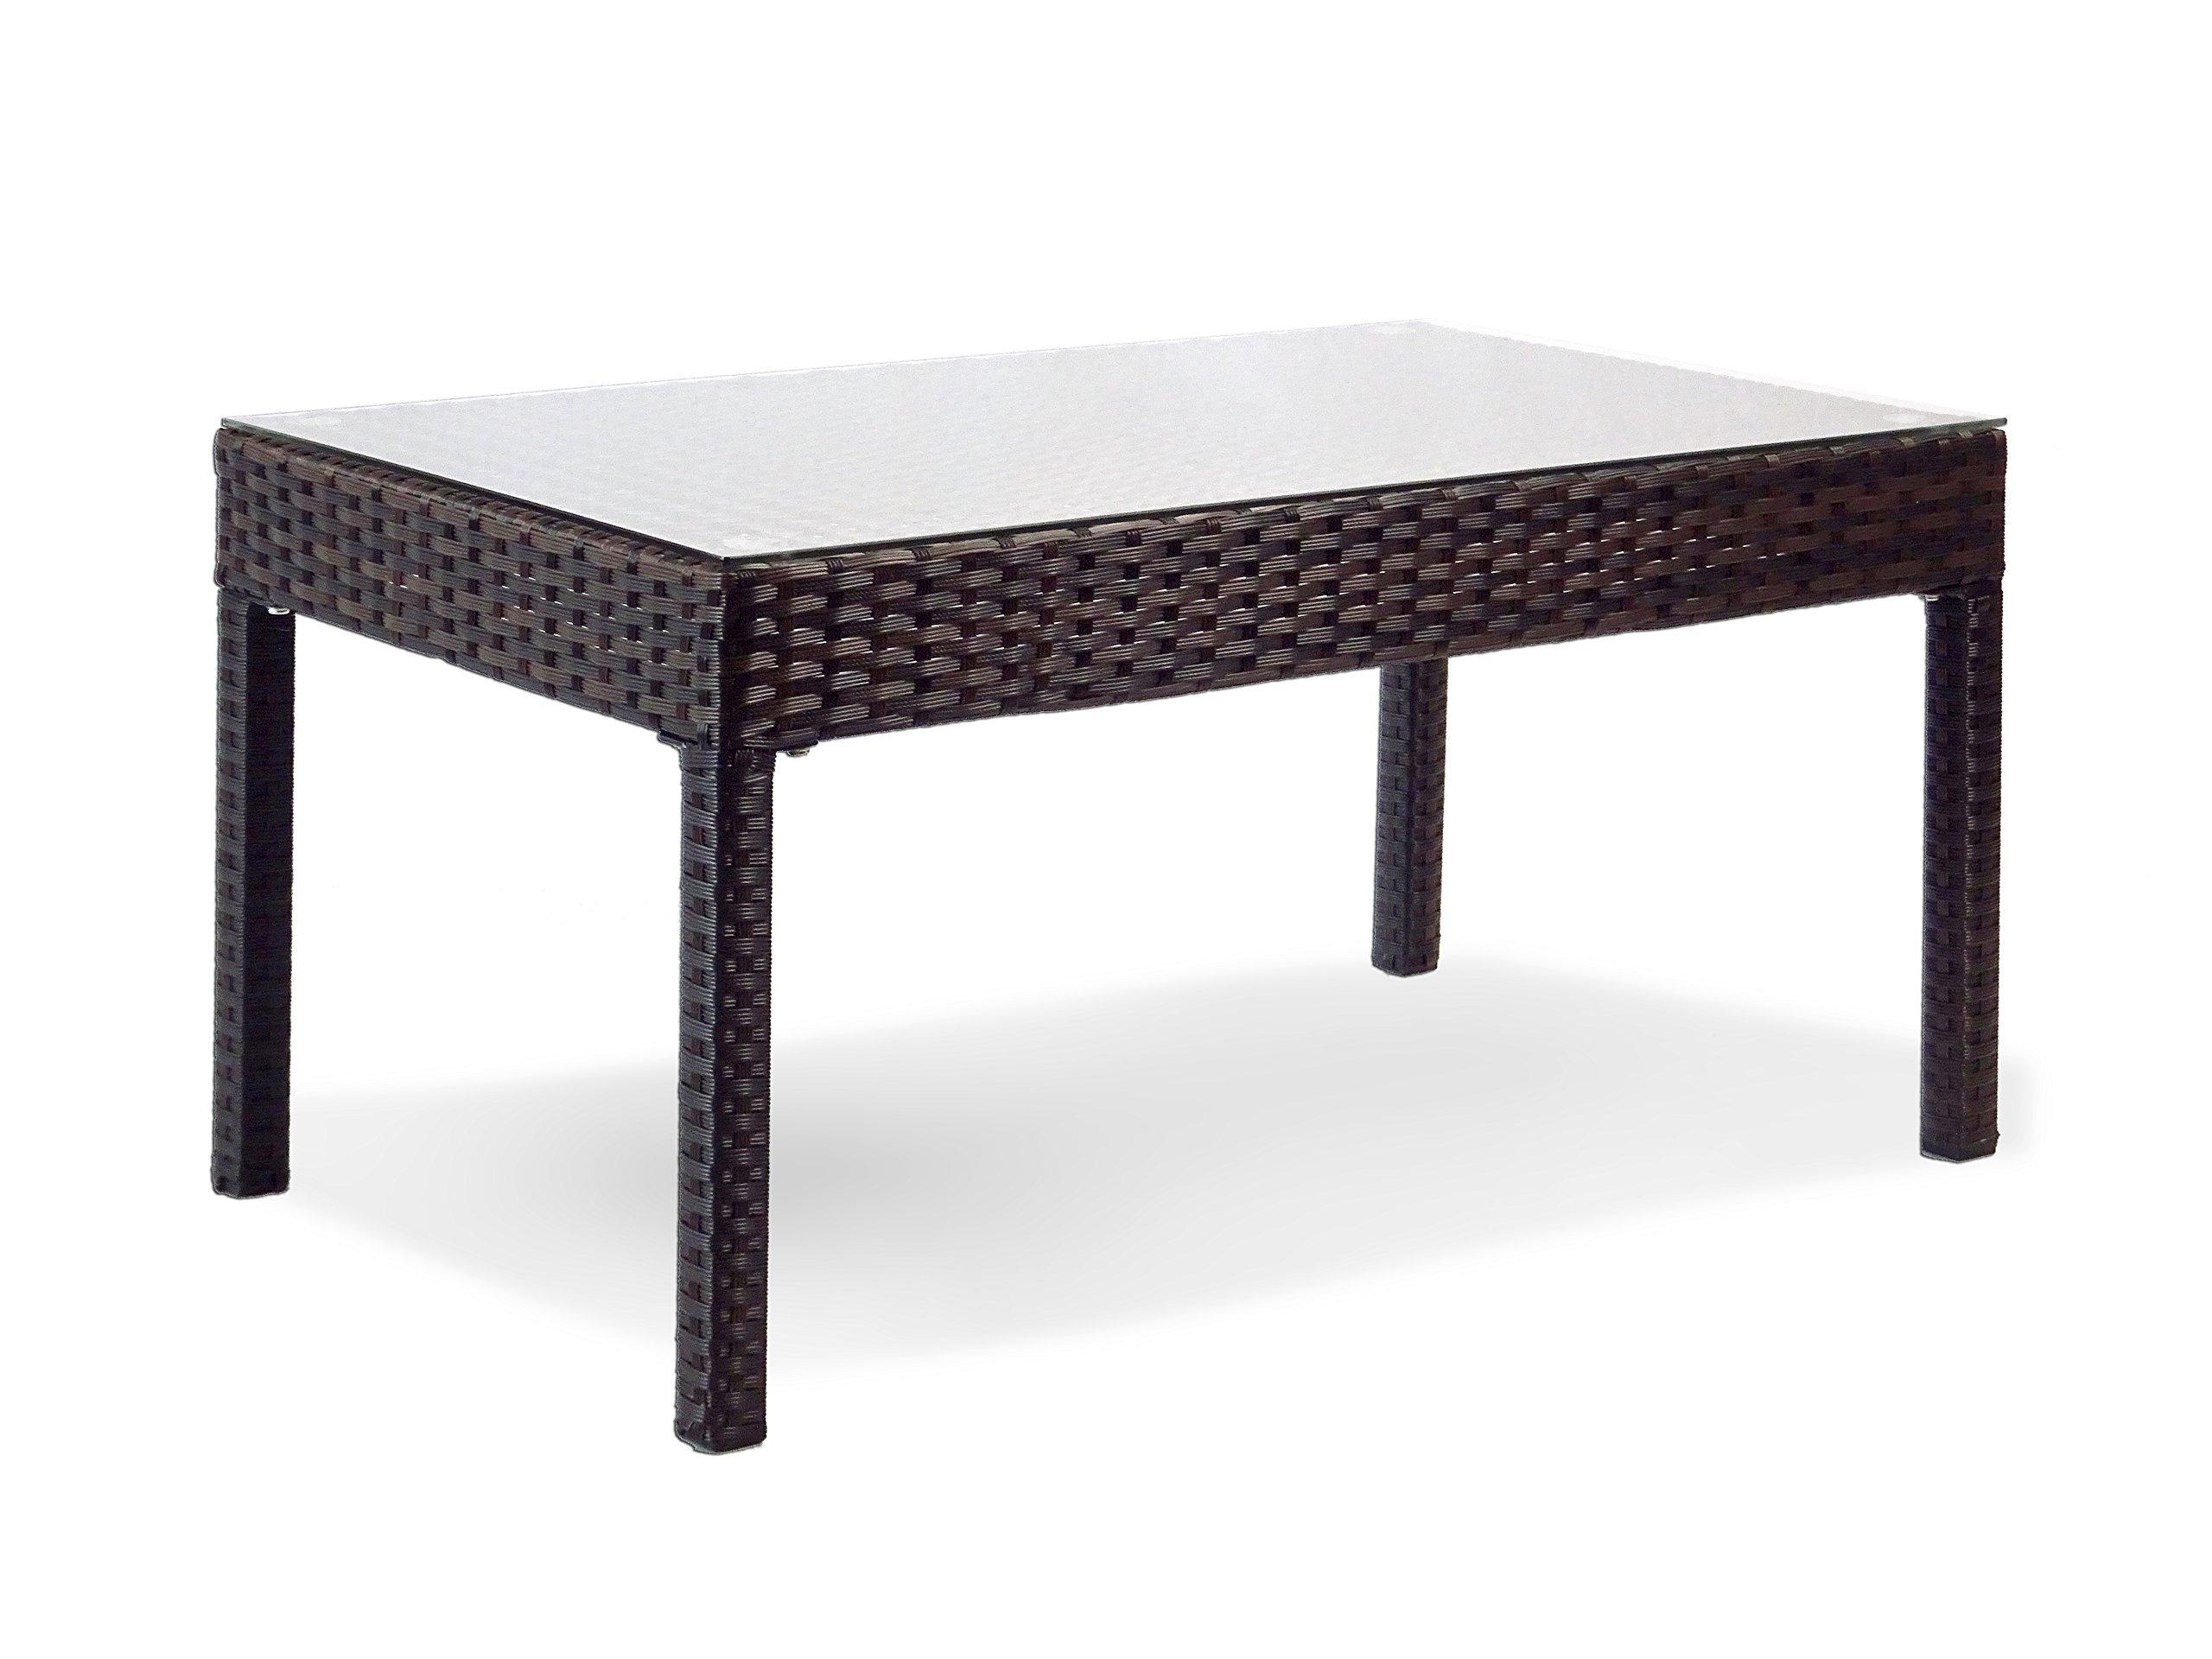 Resin Outdoor Rectangular Coffee Table w/ Glass Garden Yard Patio Wicker, Black